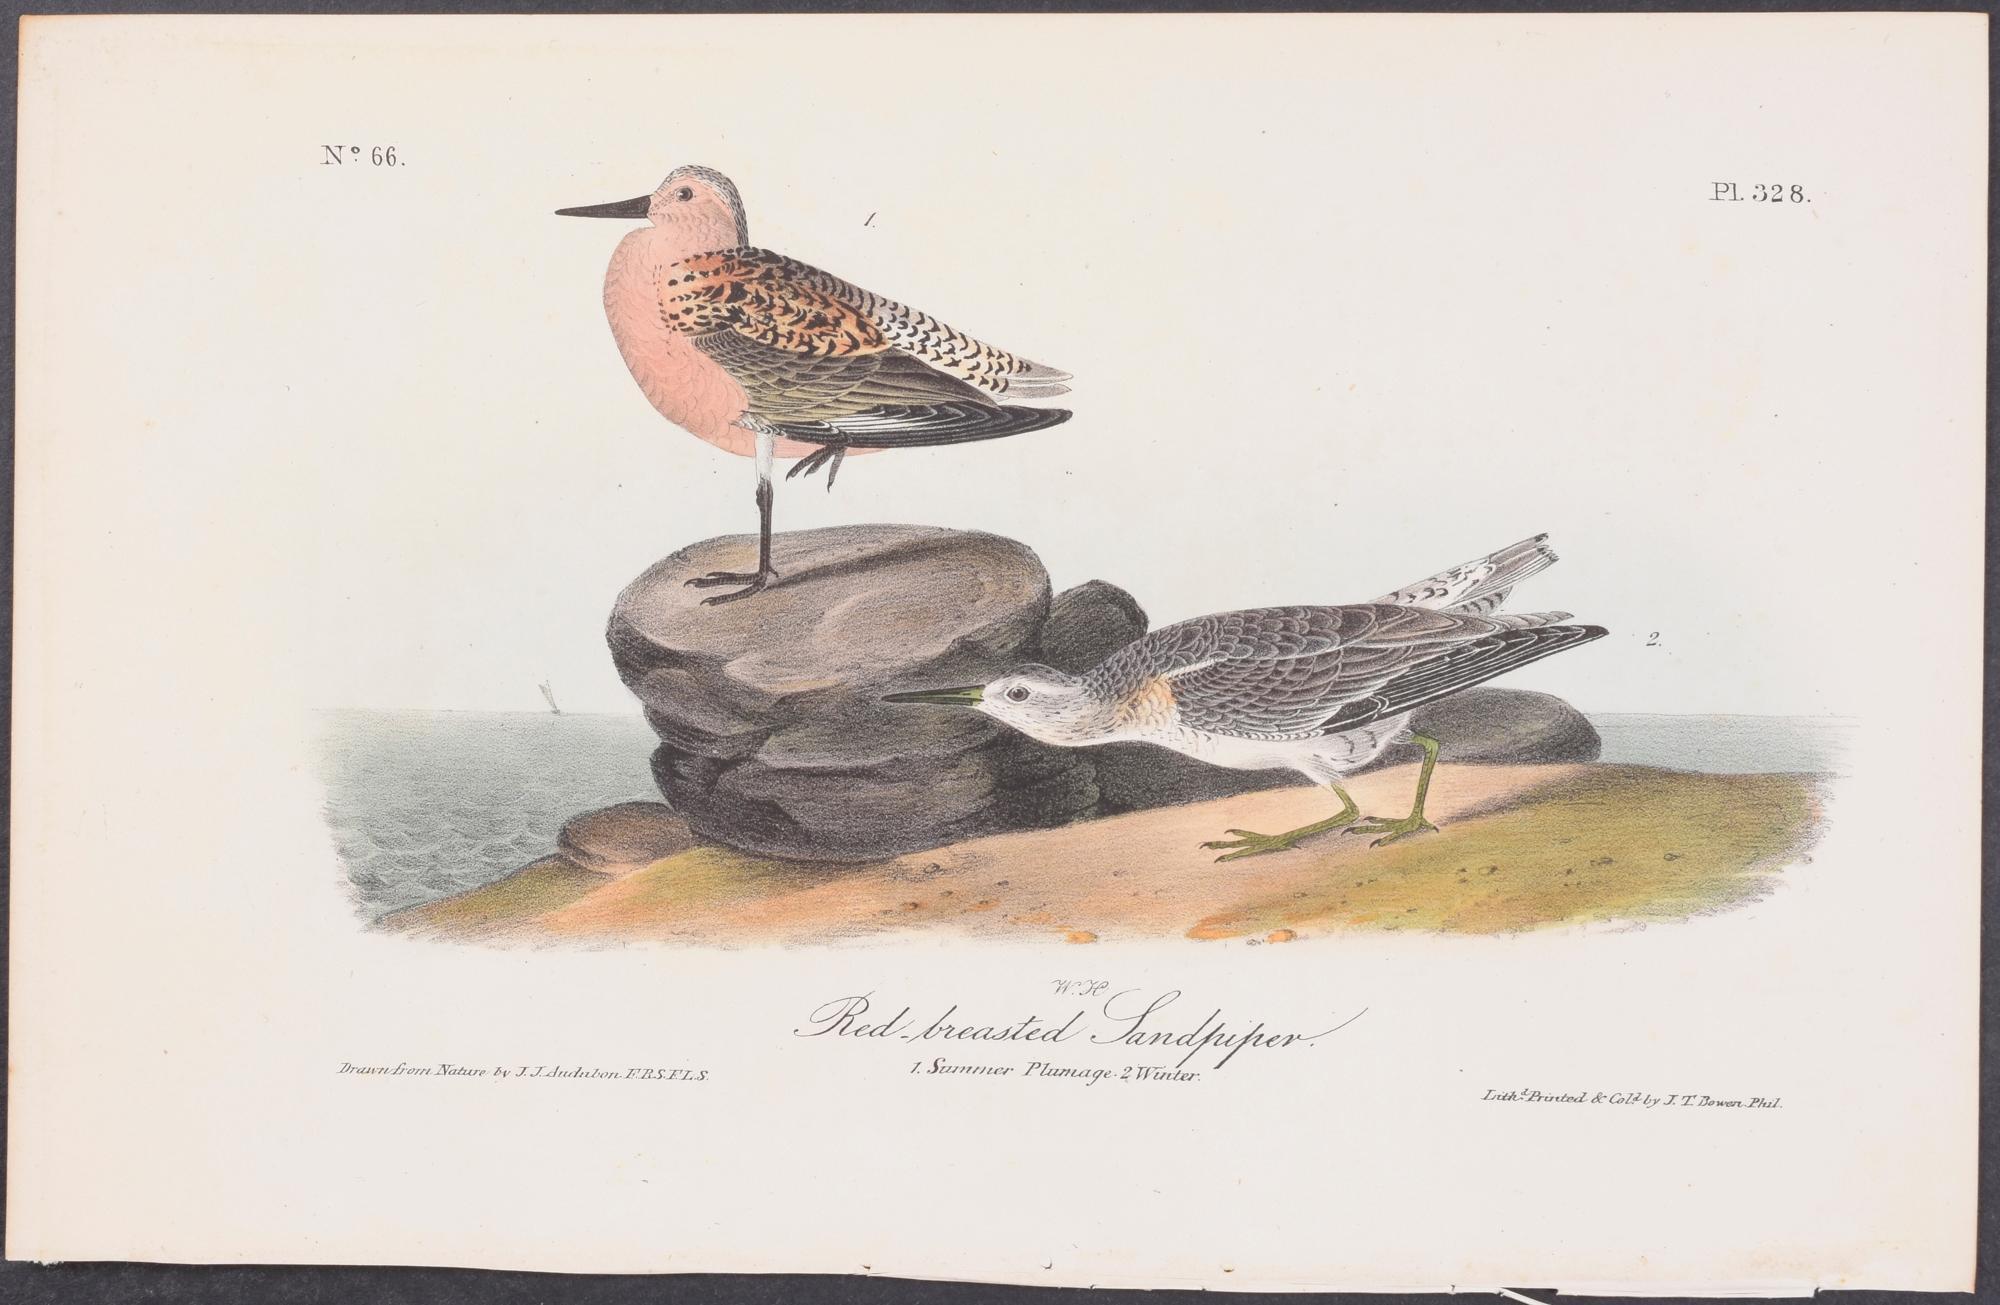 Red-breasted Sandpiper John James Audubon [Fine] (bi_30224912753) photo